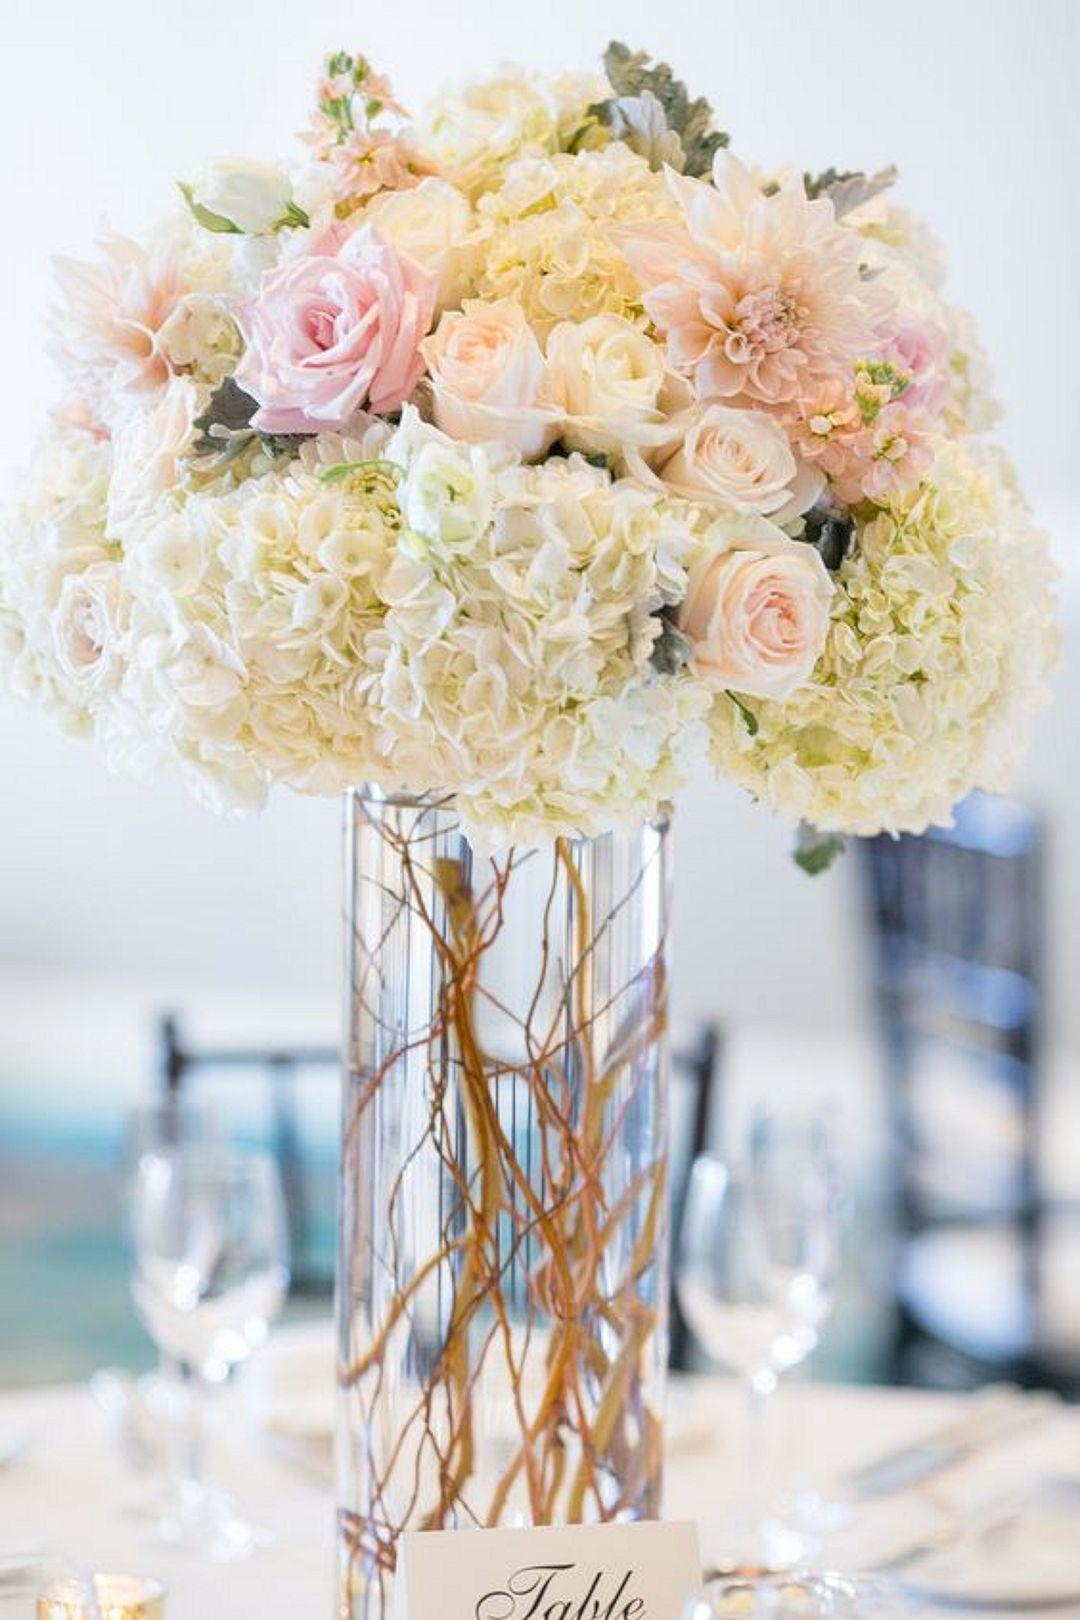 09 DIY Creative Rustic Chic Wedding Centerpieces Ideas | I do ...